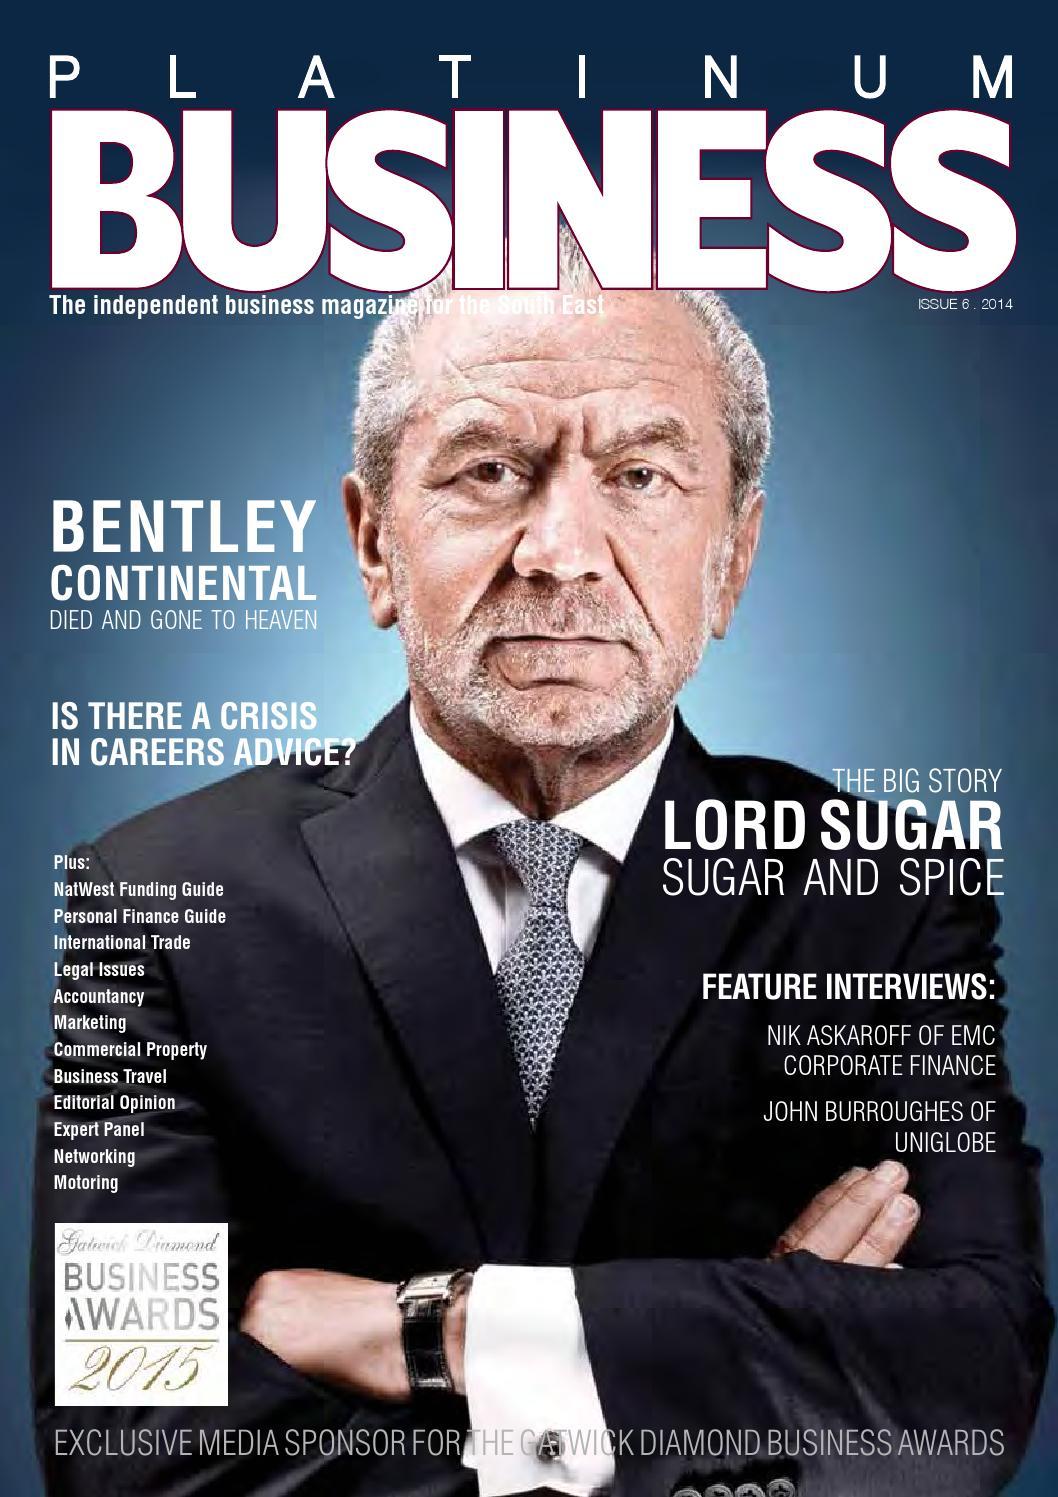 Platinum Business Magazine Issue 6 By Platinum Business